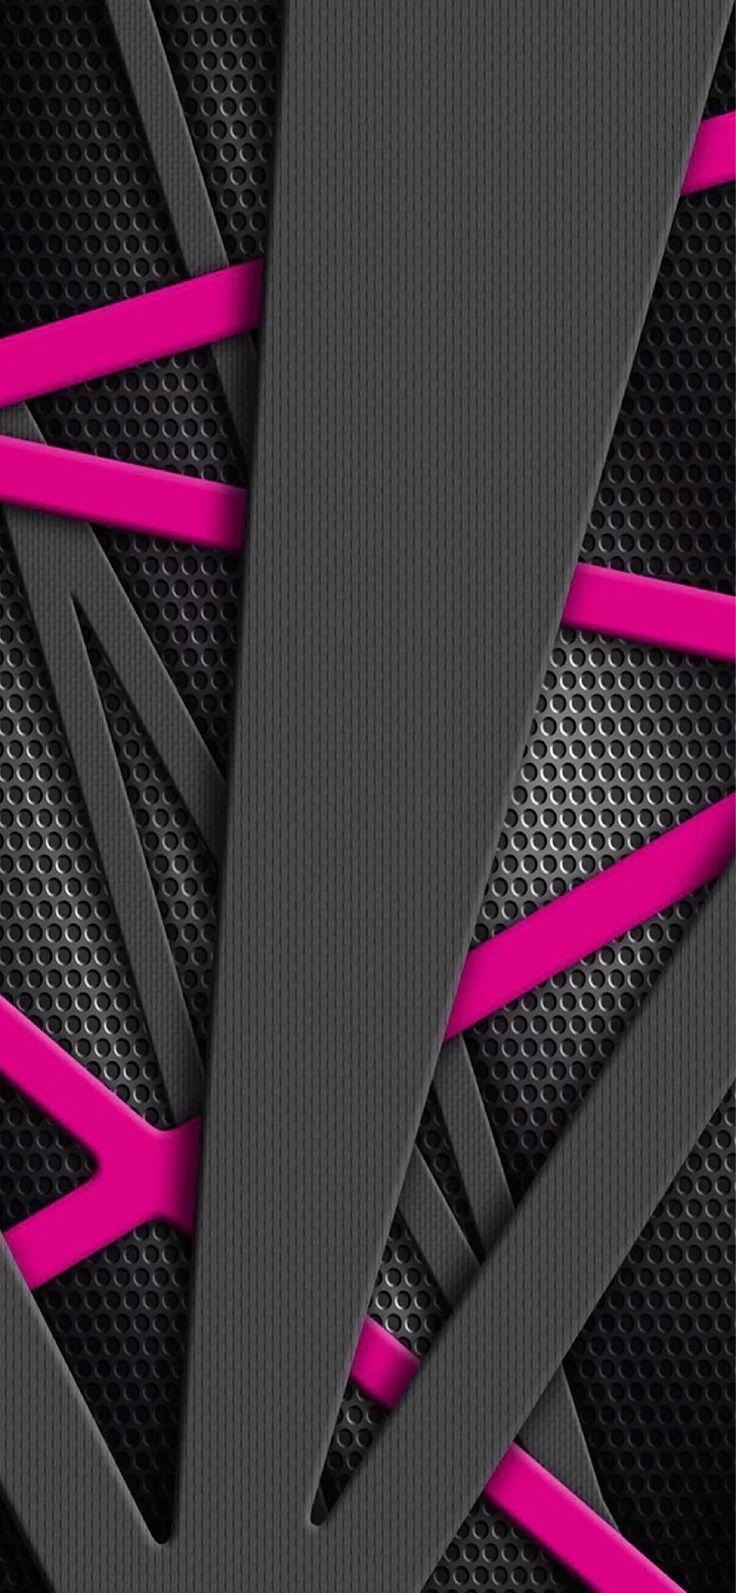 Samsung Wallpaper Fall Hintergrundbild Tapete Samsung Wallpaper Ios11 Ios12 Lockscreen Homescreen Wa Samsung Wallpaper Phone Wallpaper Fall Wallpaper